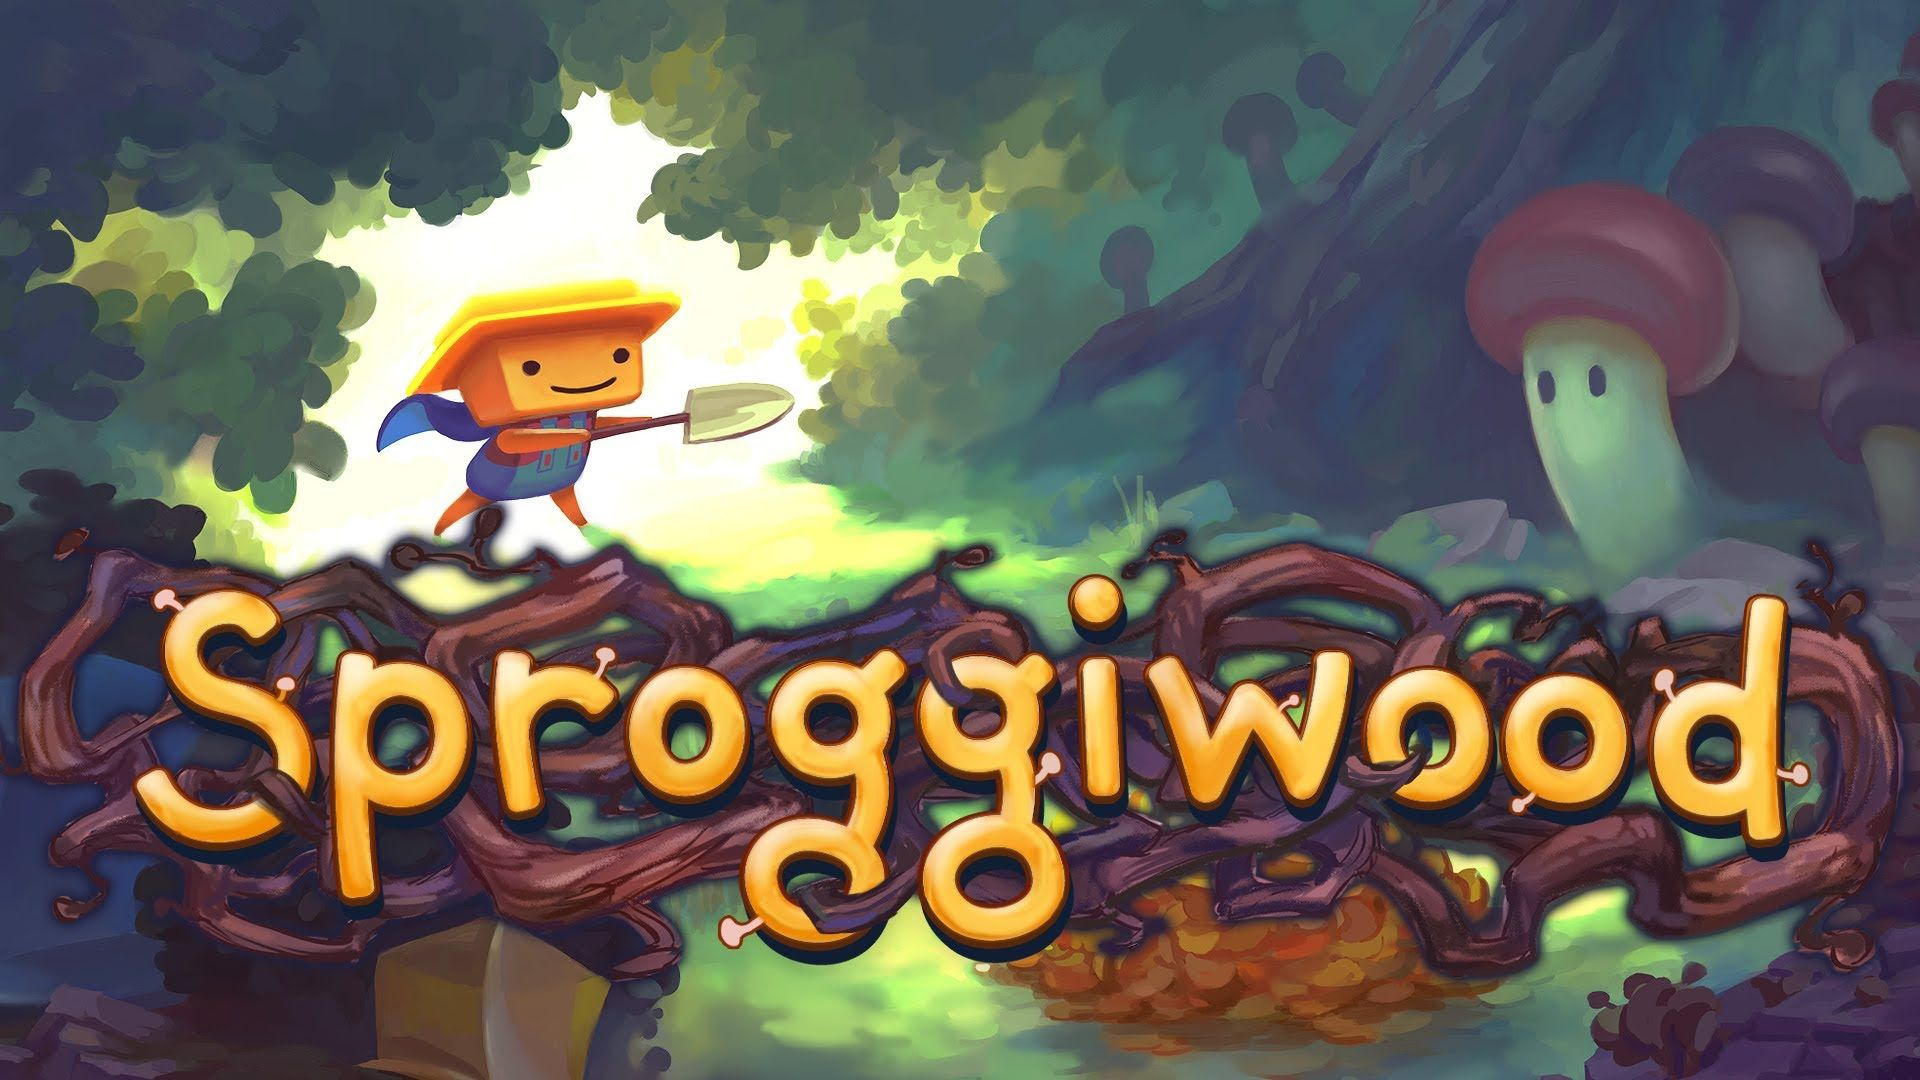 Sproggiwood Mobile Trailer Android mobile games, Video